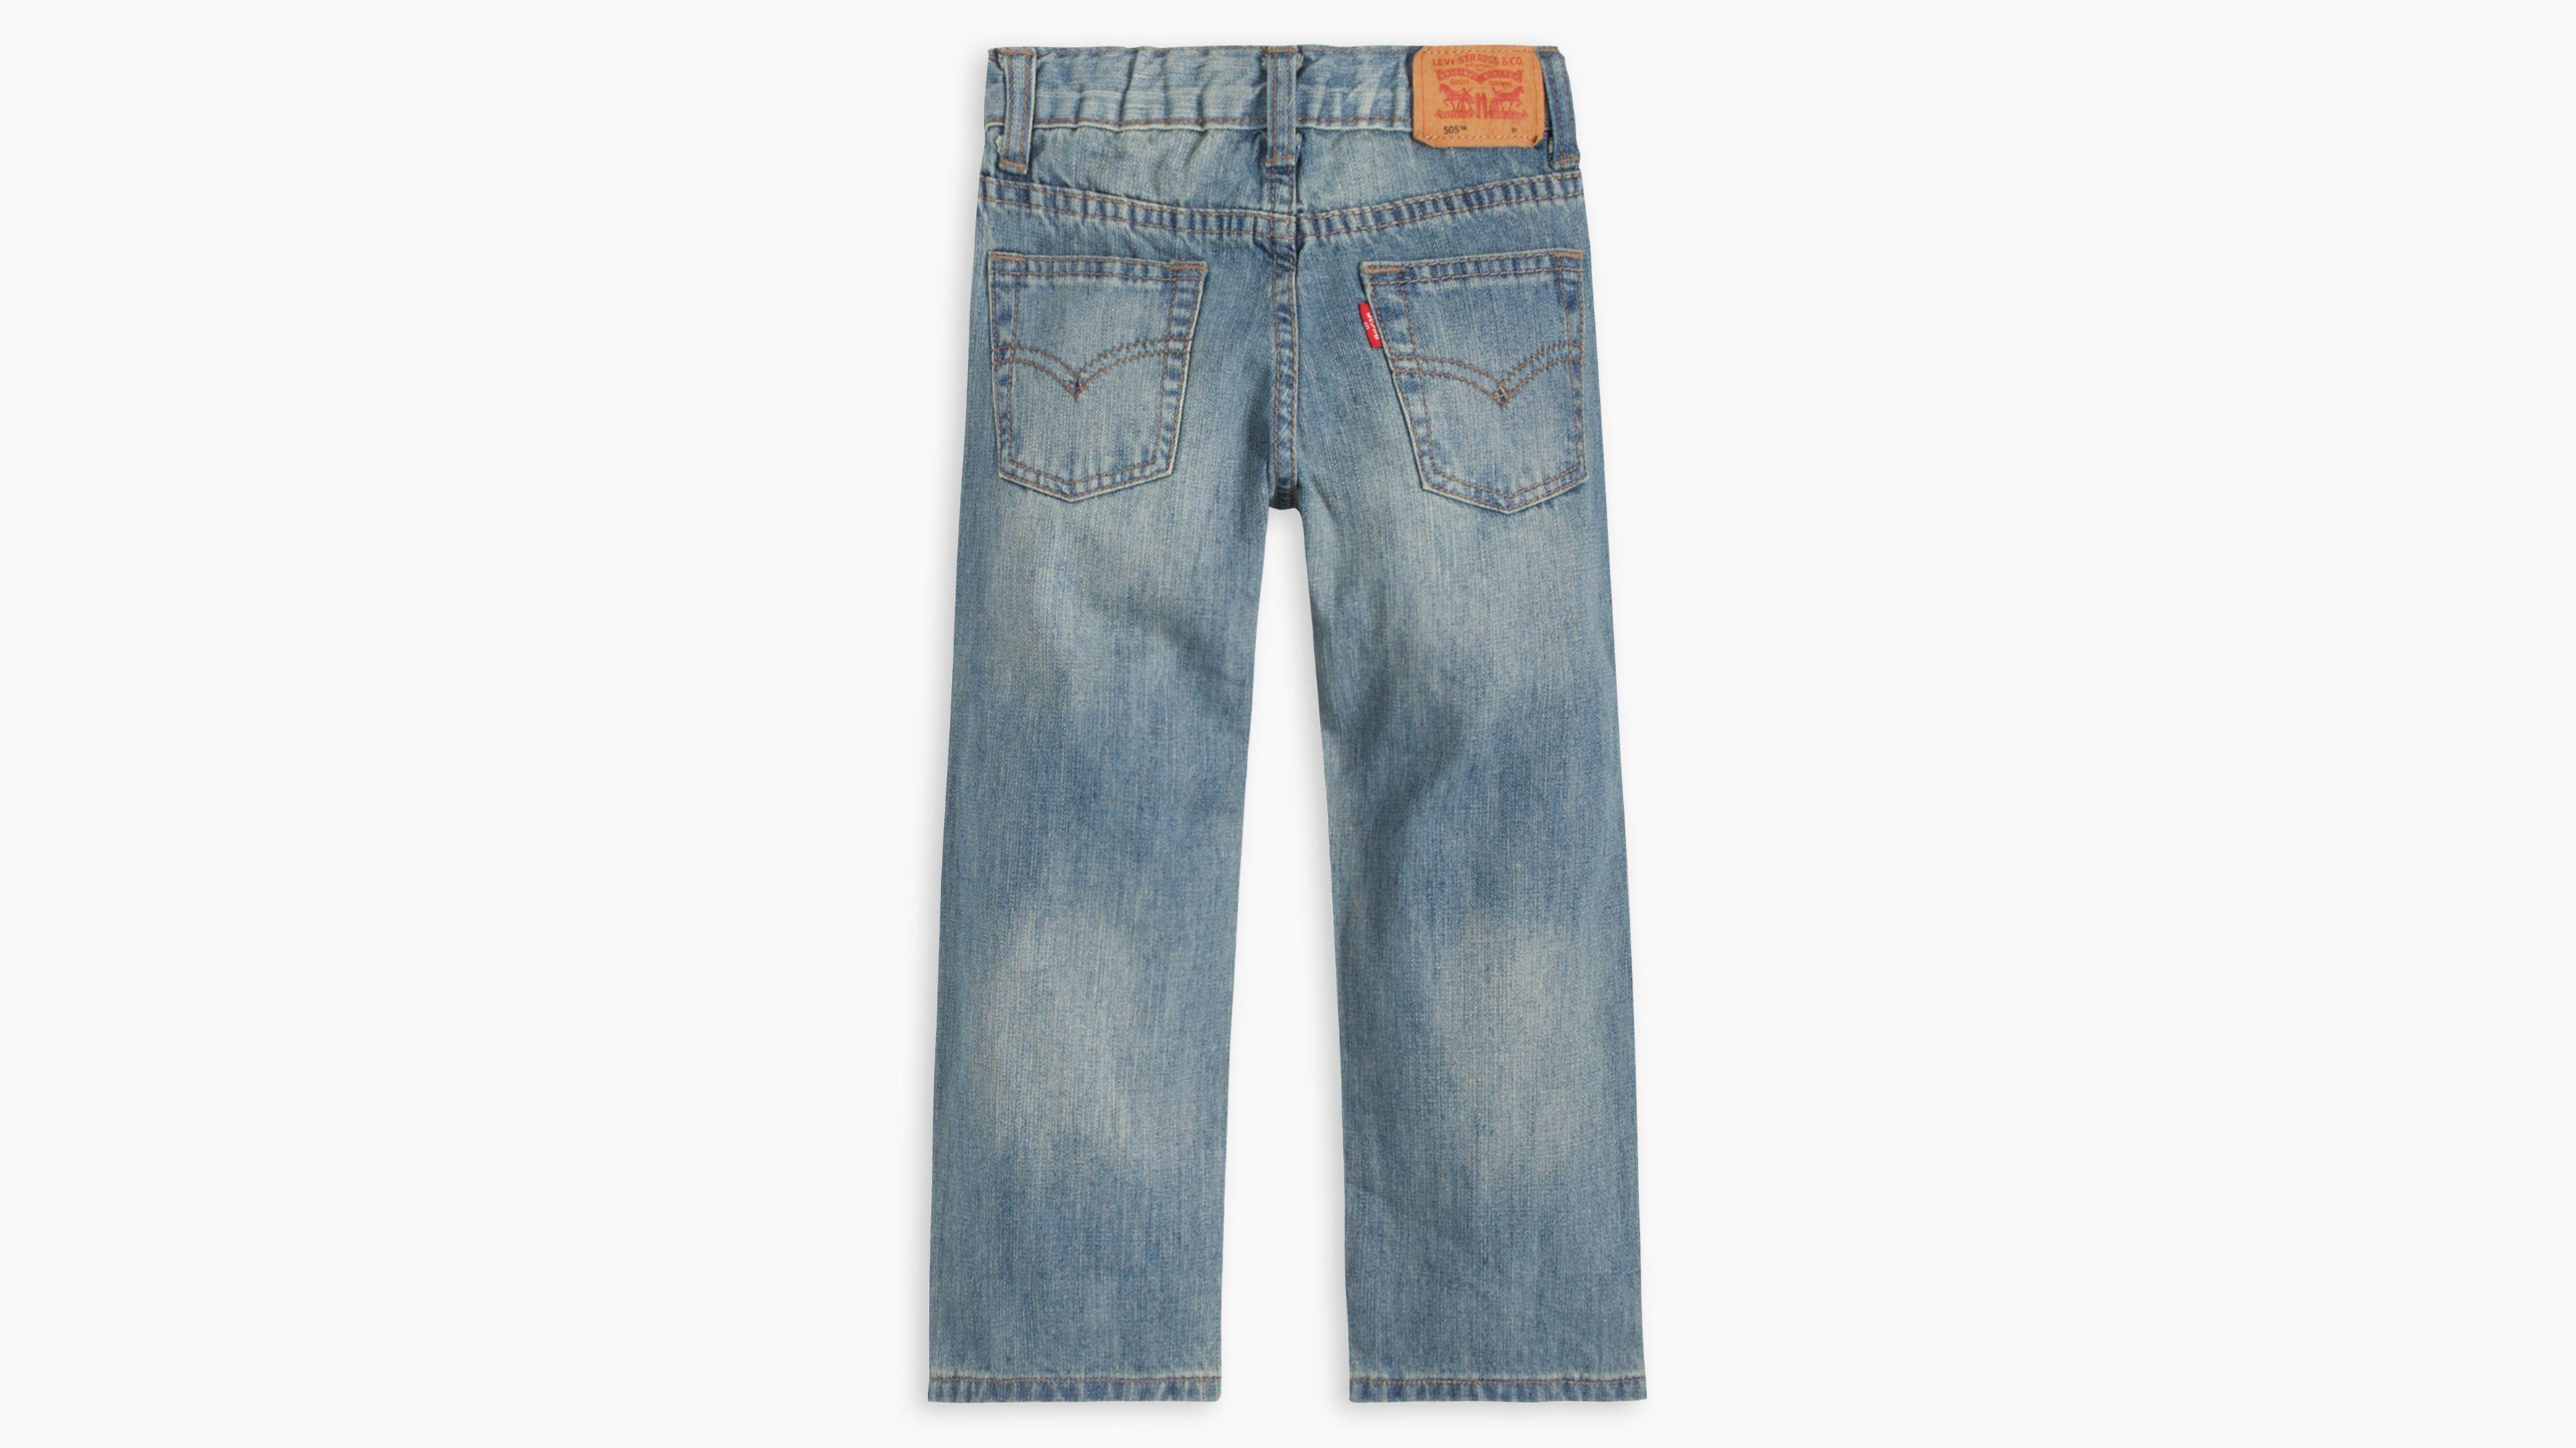 e6484b9bb71 Toddler Boys 2t-4t 505™ Regular Fit Jeans - Light Wash | Levi's® US